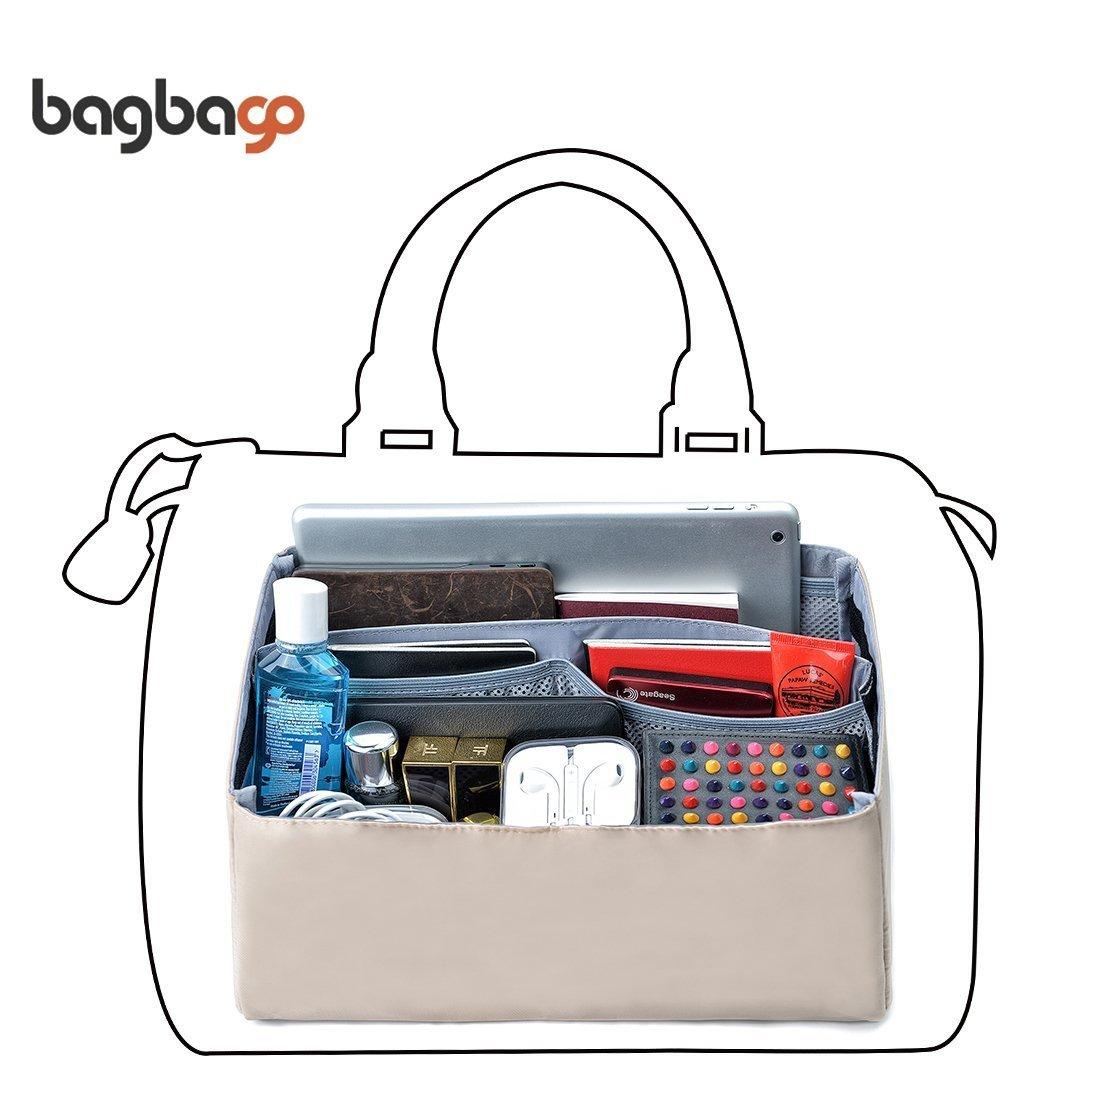 BES CHAN Womens Purse Handbag Bag Organizer Insert with Handles,Medium,Large (Large, Khaki)